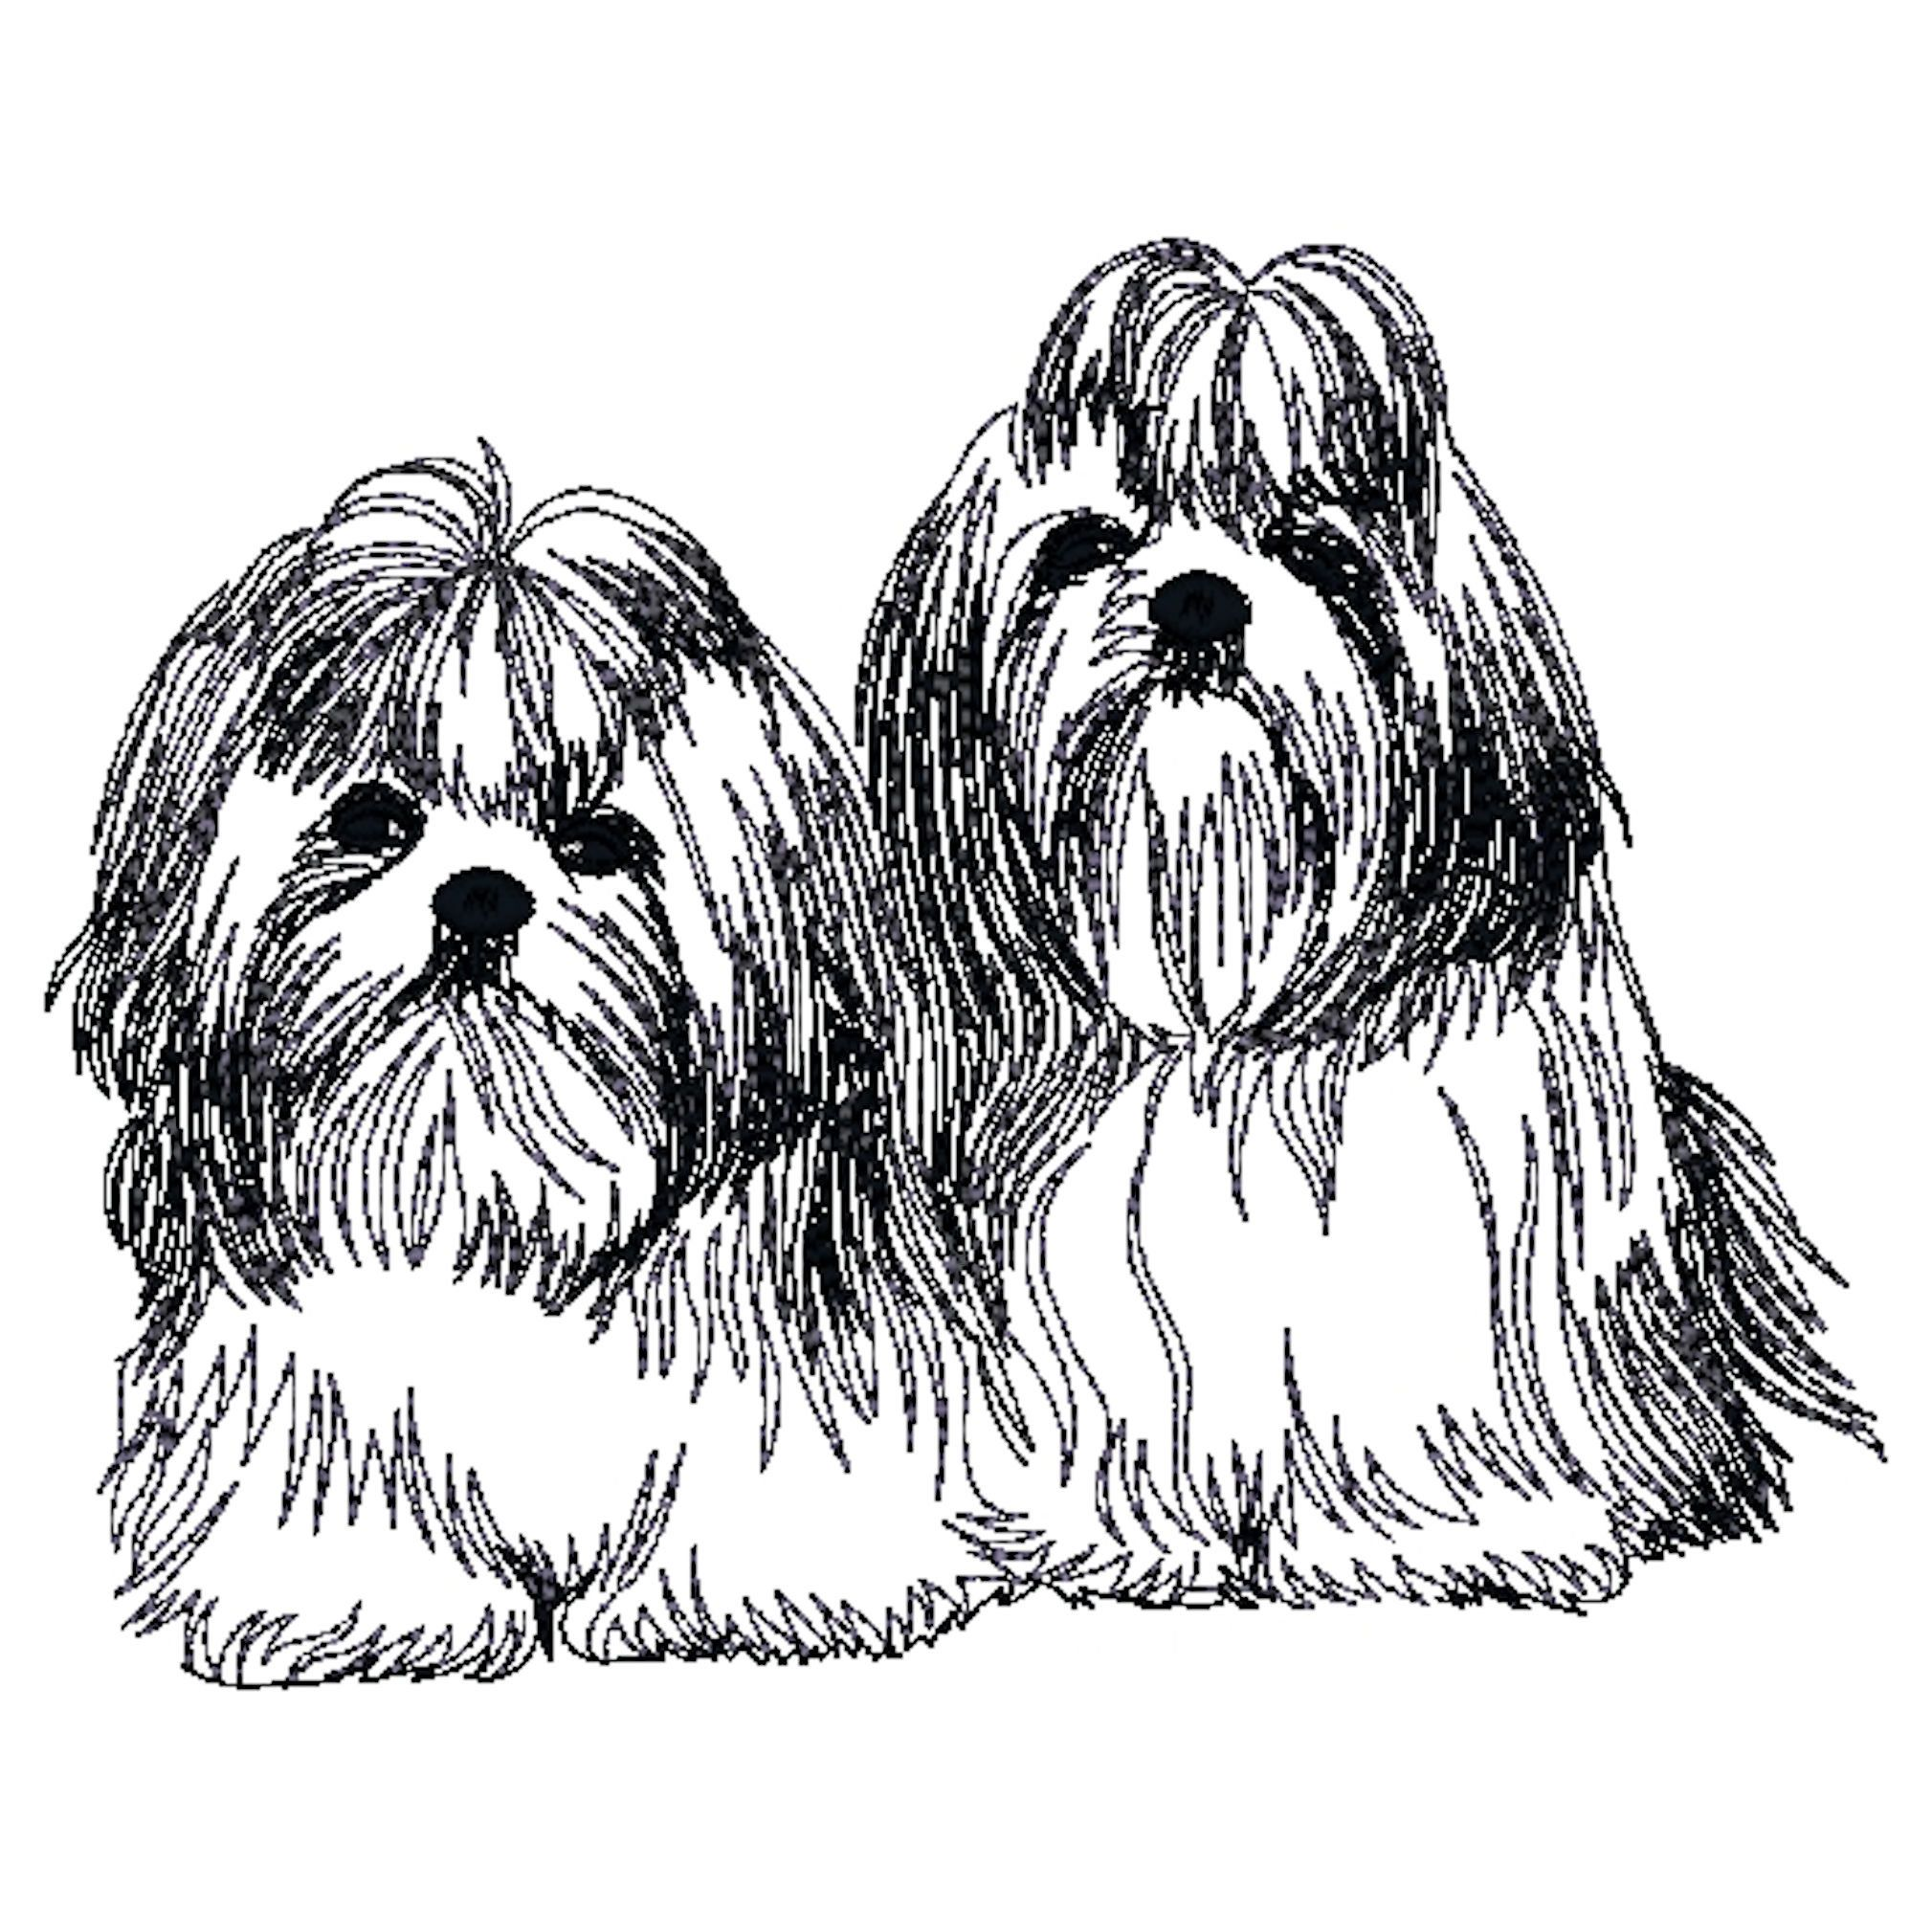 Shih Tzu Dog Embroidered Towels Dog Towels Personalised